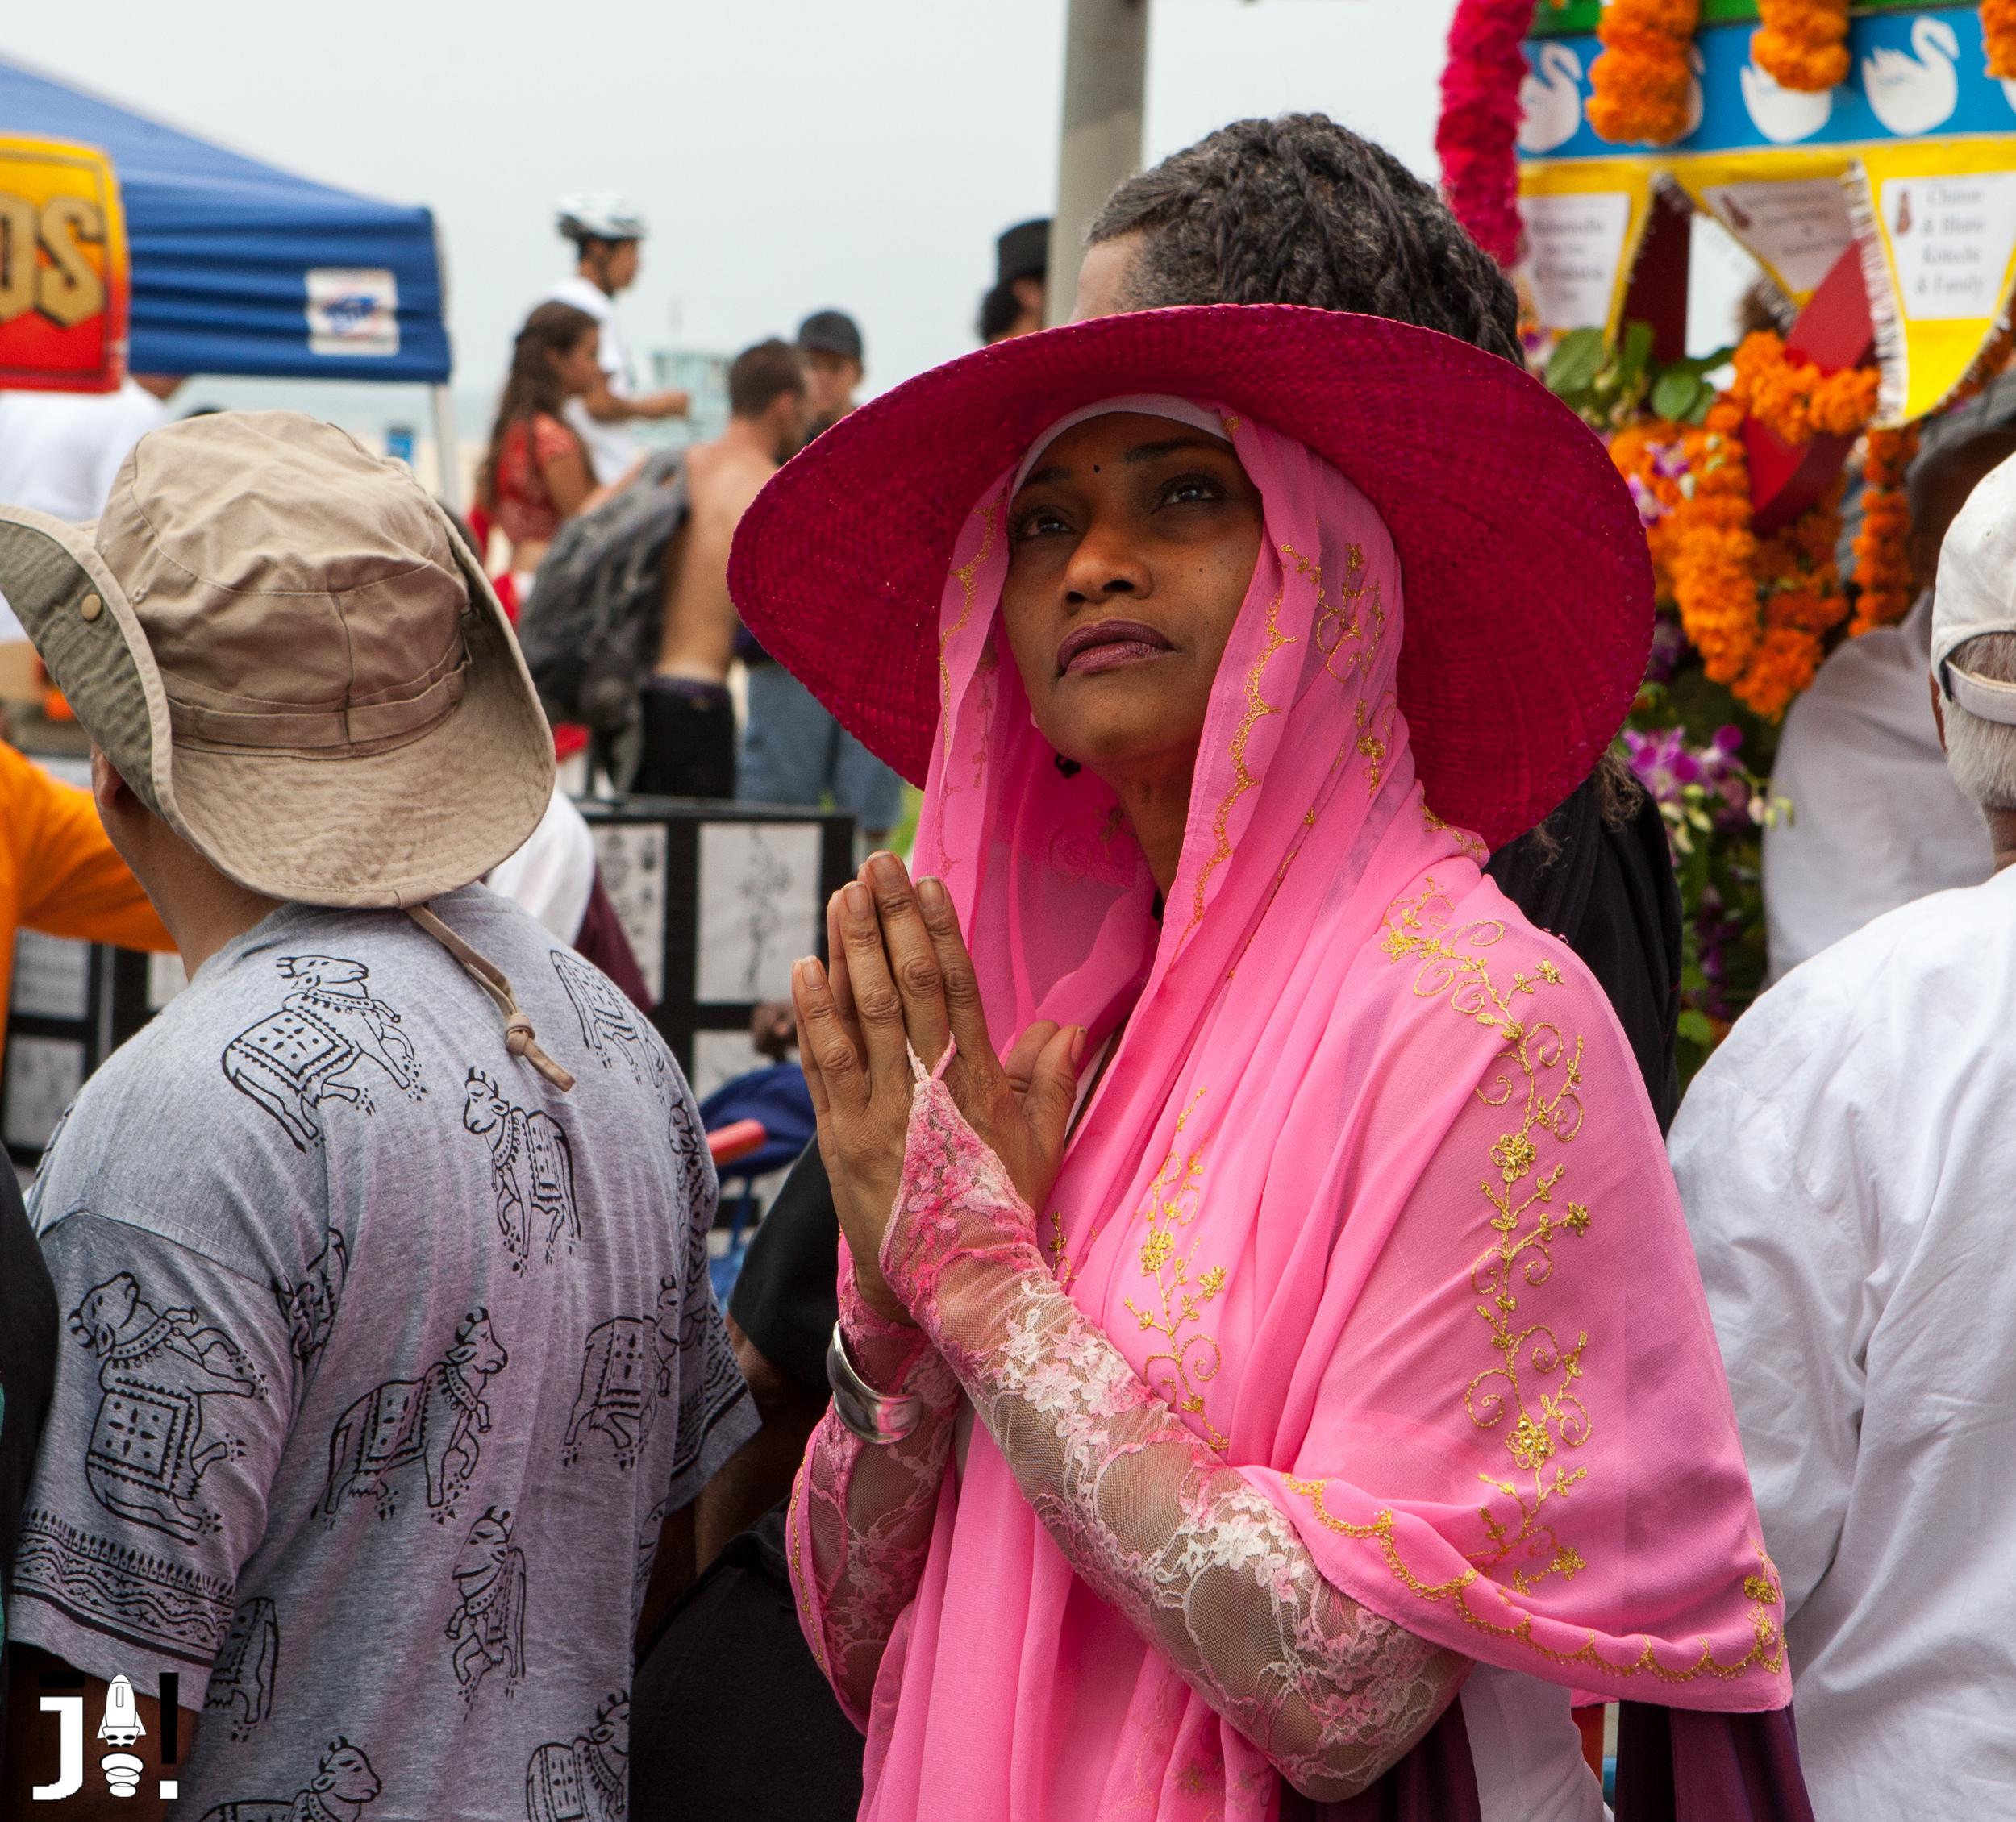 Hari Krishna Parade on Venice Boardwalk-32.jpg